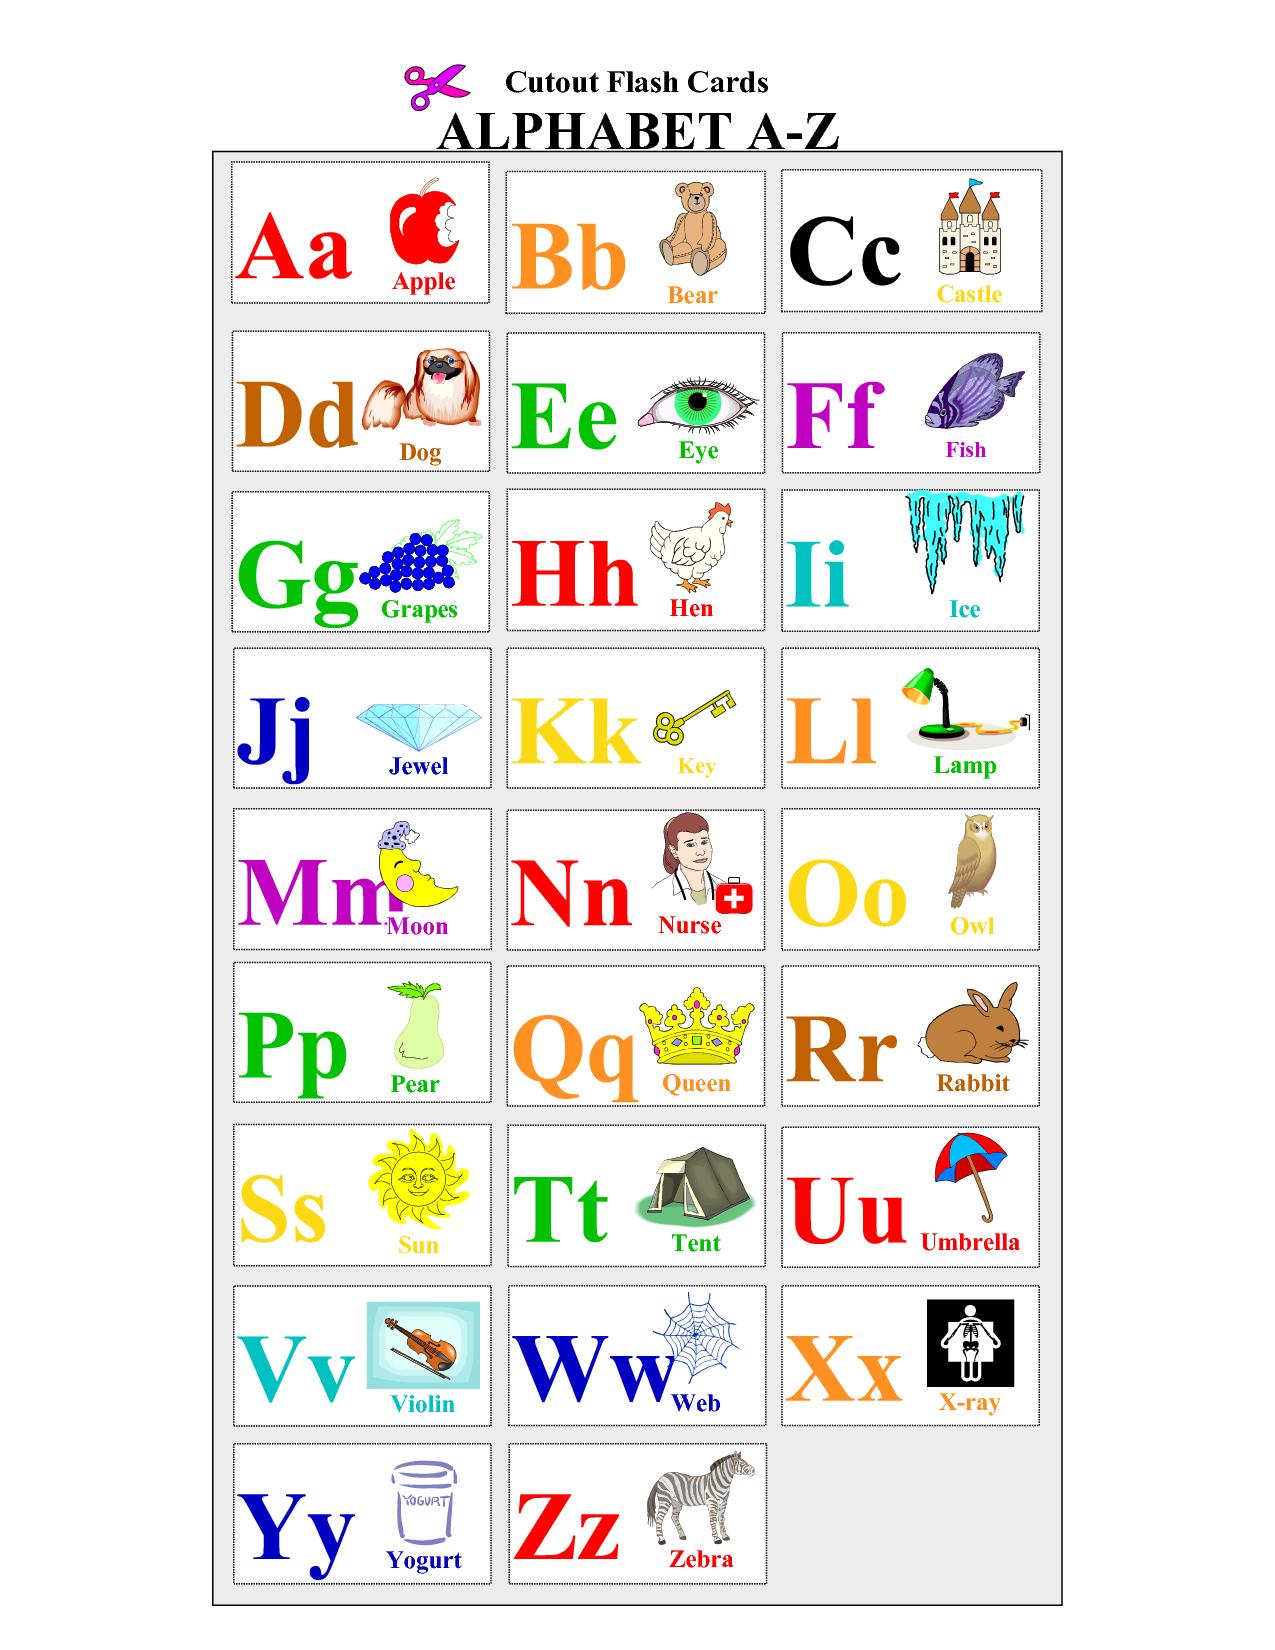 Printable Alphabet | Printable Alphabet Cards Educational Flash - Free Printable Alphabet Cards With Pictures